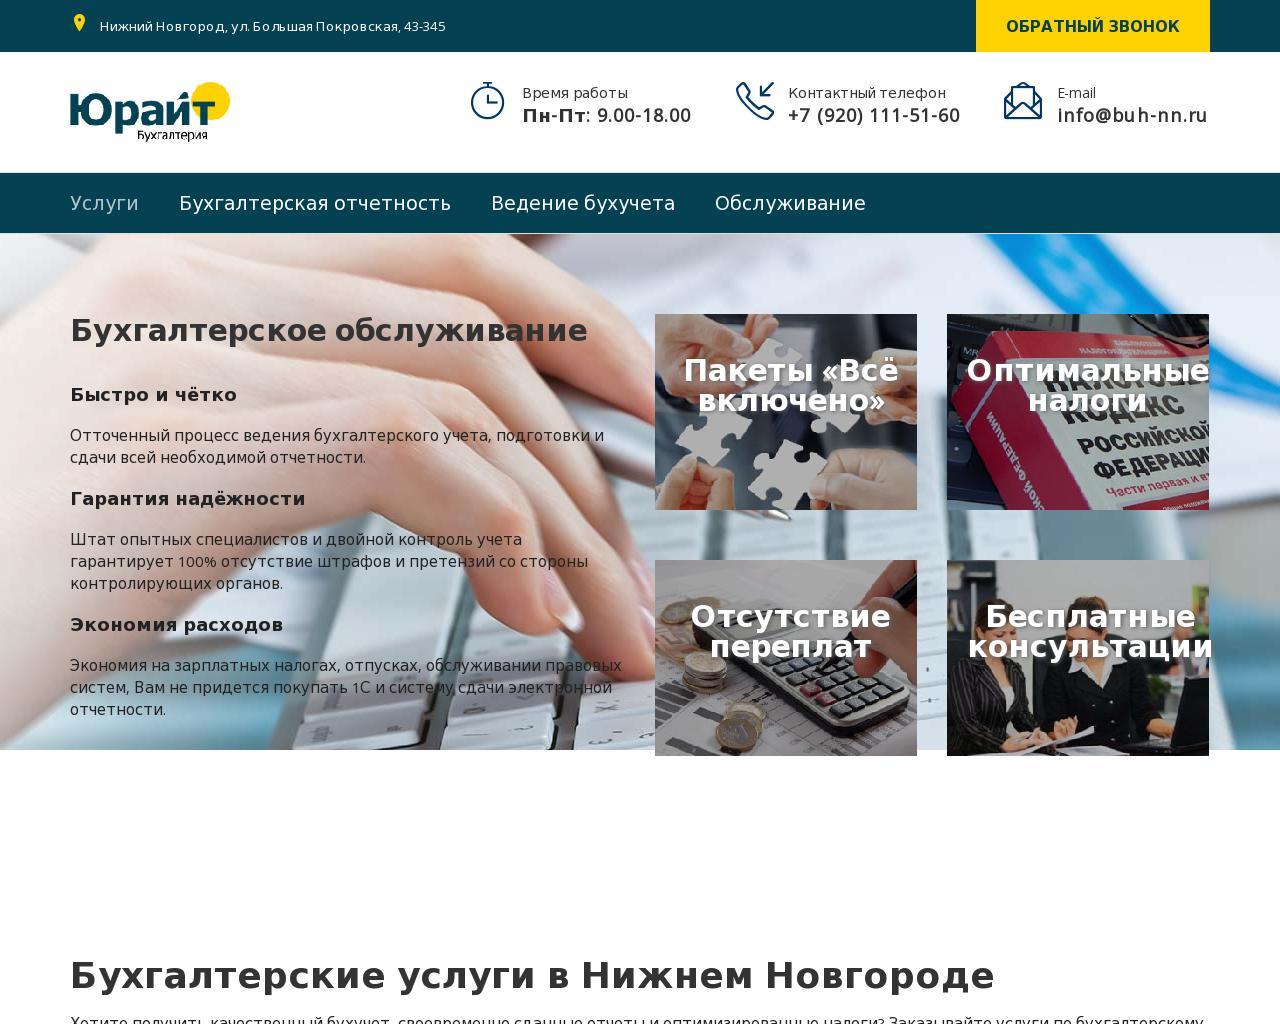 агентство бухгалтерских услуг нижний новгород